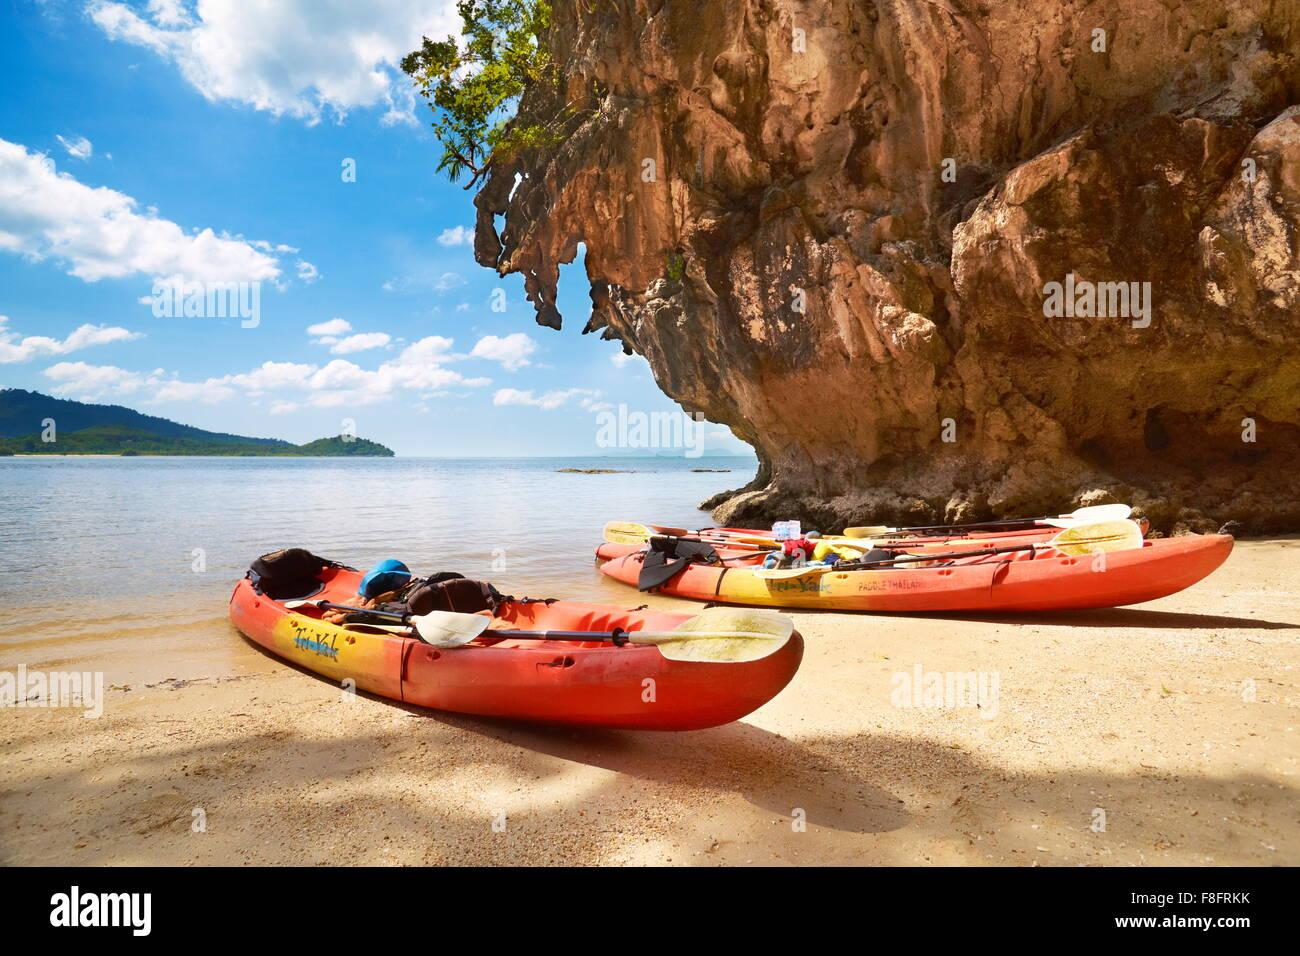 Thailand - Phang Nga Bay landscape, canoe trip - Stock Image